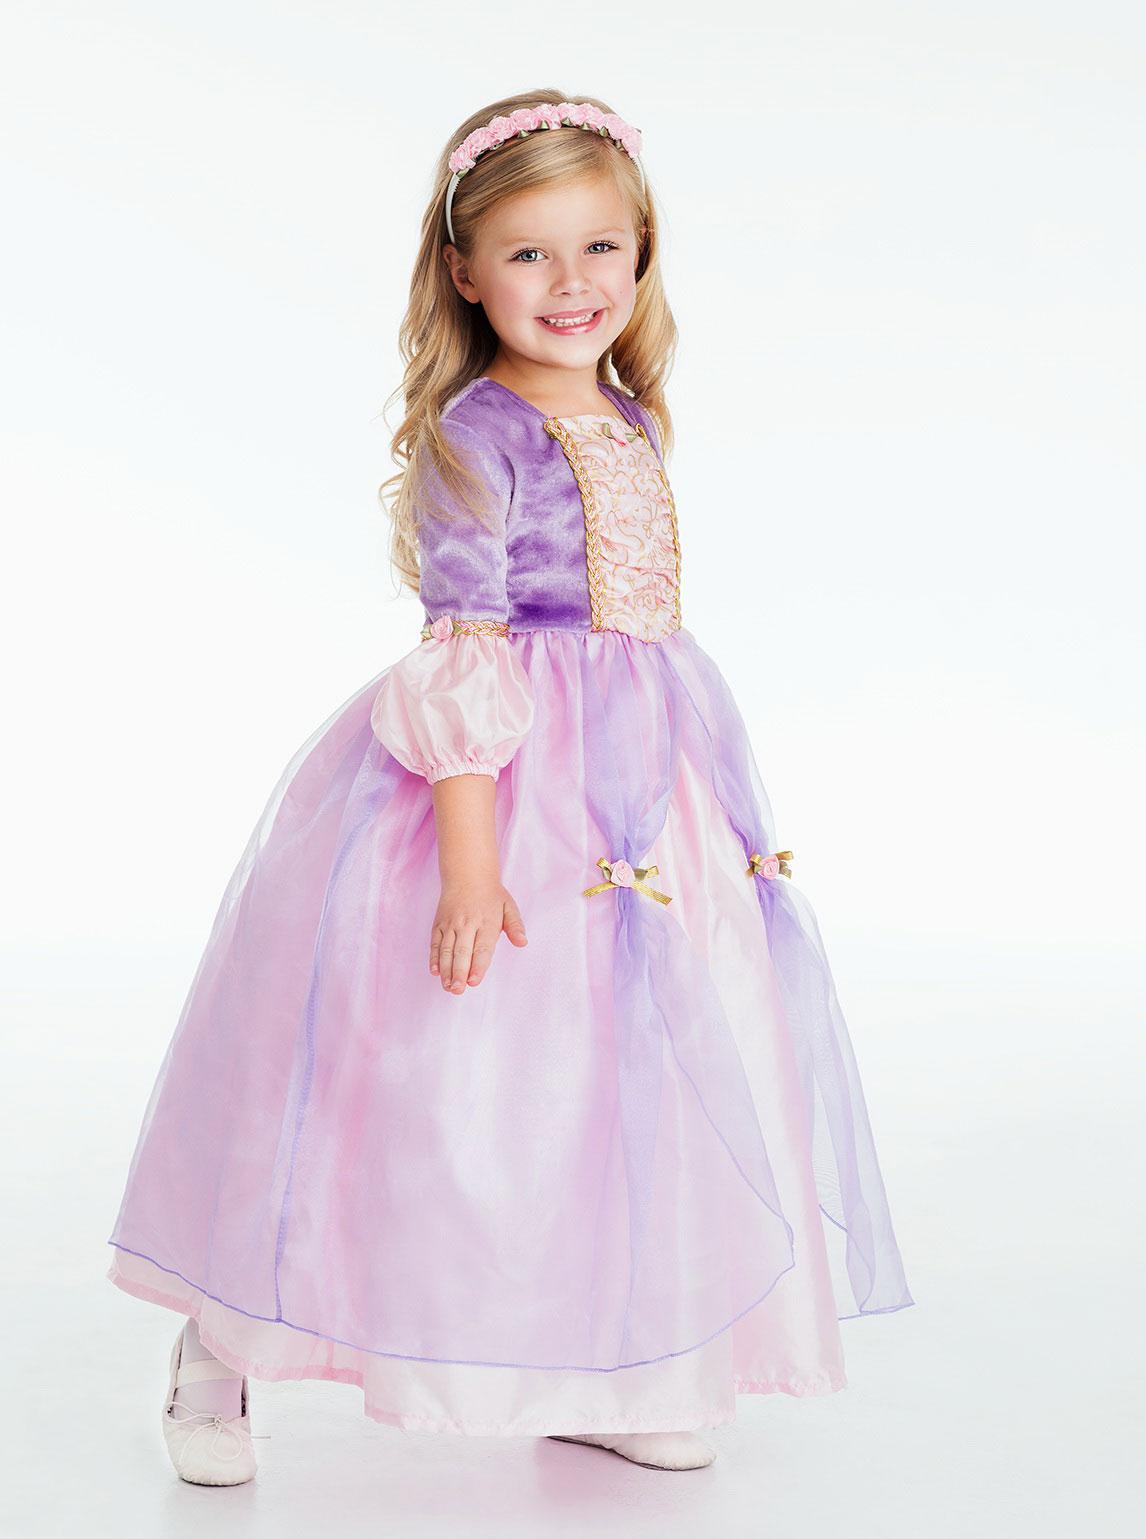 LA Girls Costume Style Rapunzel Princess Dress Up Dresses